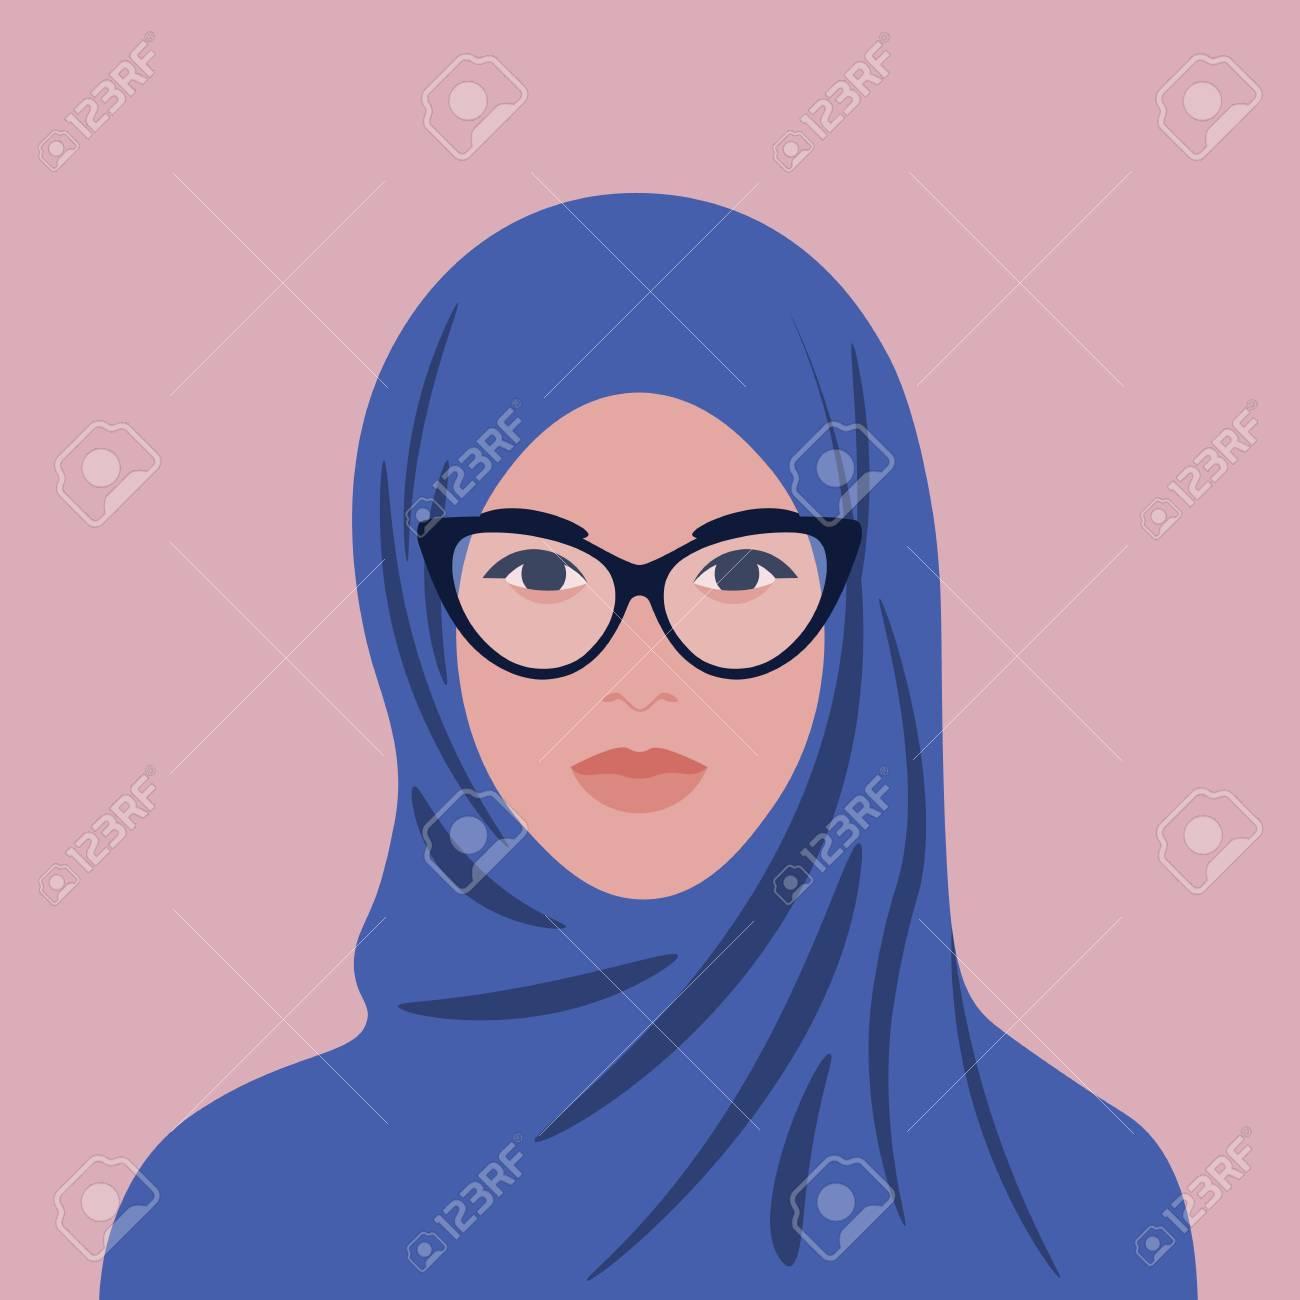 Portrait of an arabian woman in hijab and glasses. Muslim girl avatar. Vector flat illustration - 123245369